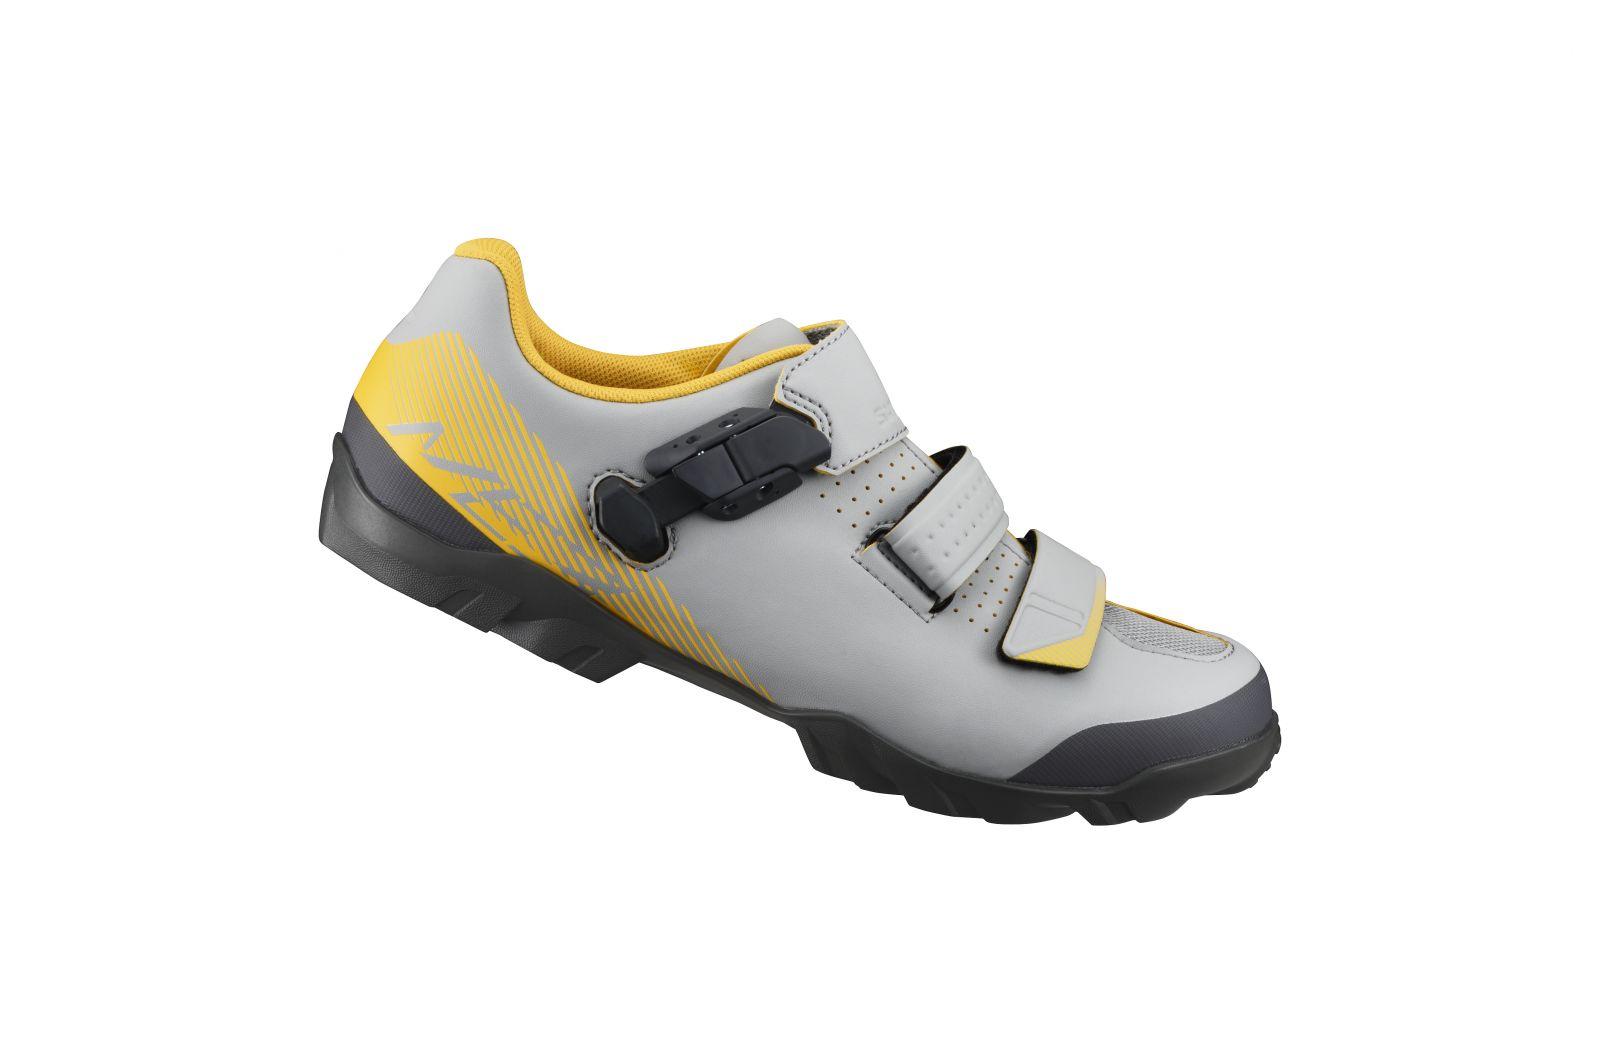 SHIMANO MTB obuv SH-ME300MG, šedá žlutá, 40